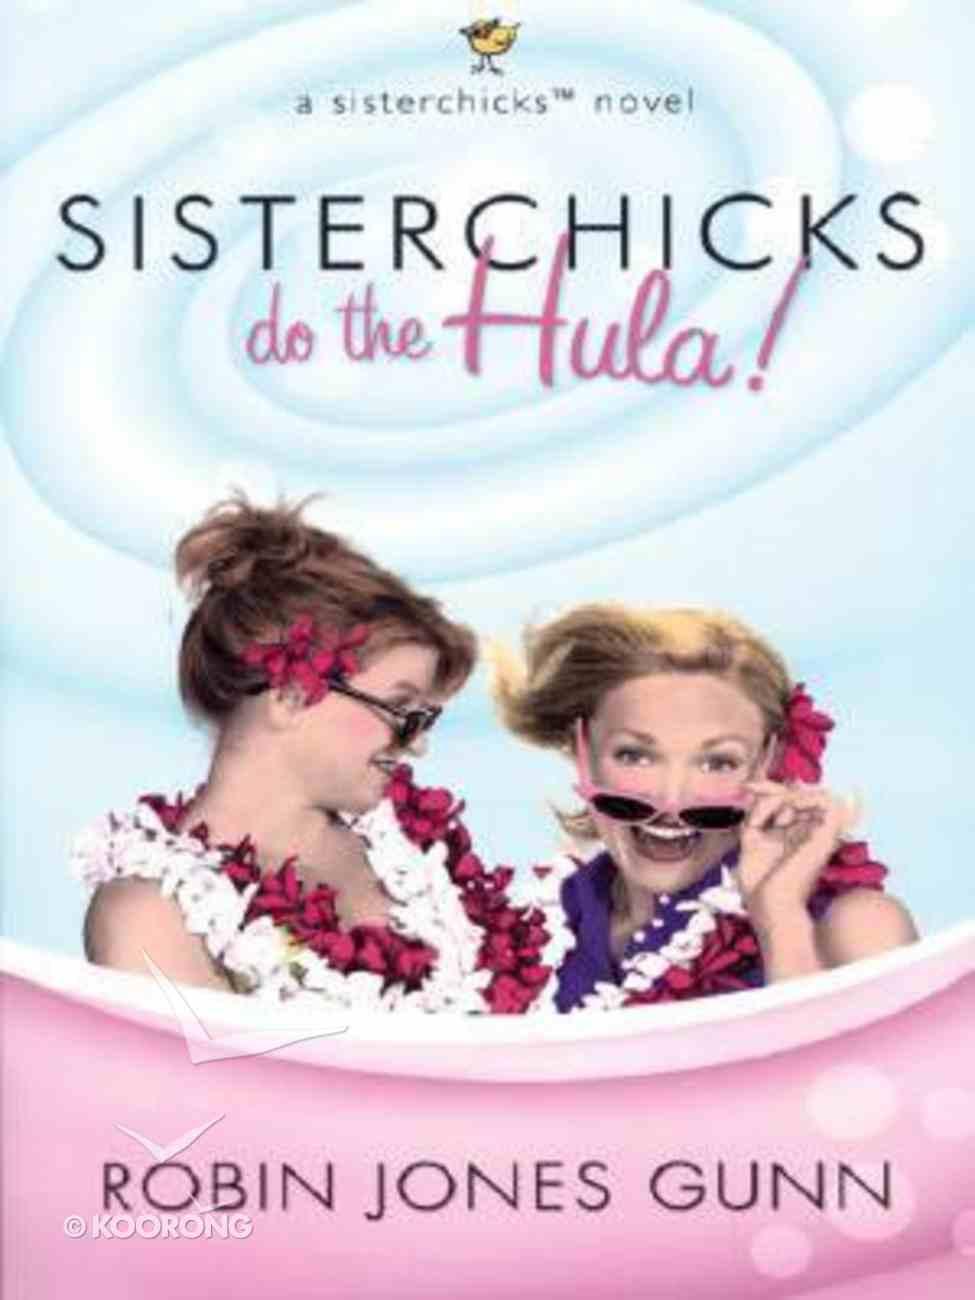 Sisterchicks Do the Hula! (Large Print) (#02 in Sisterchicks Series) Paperback